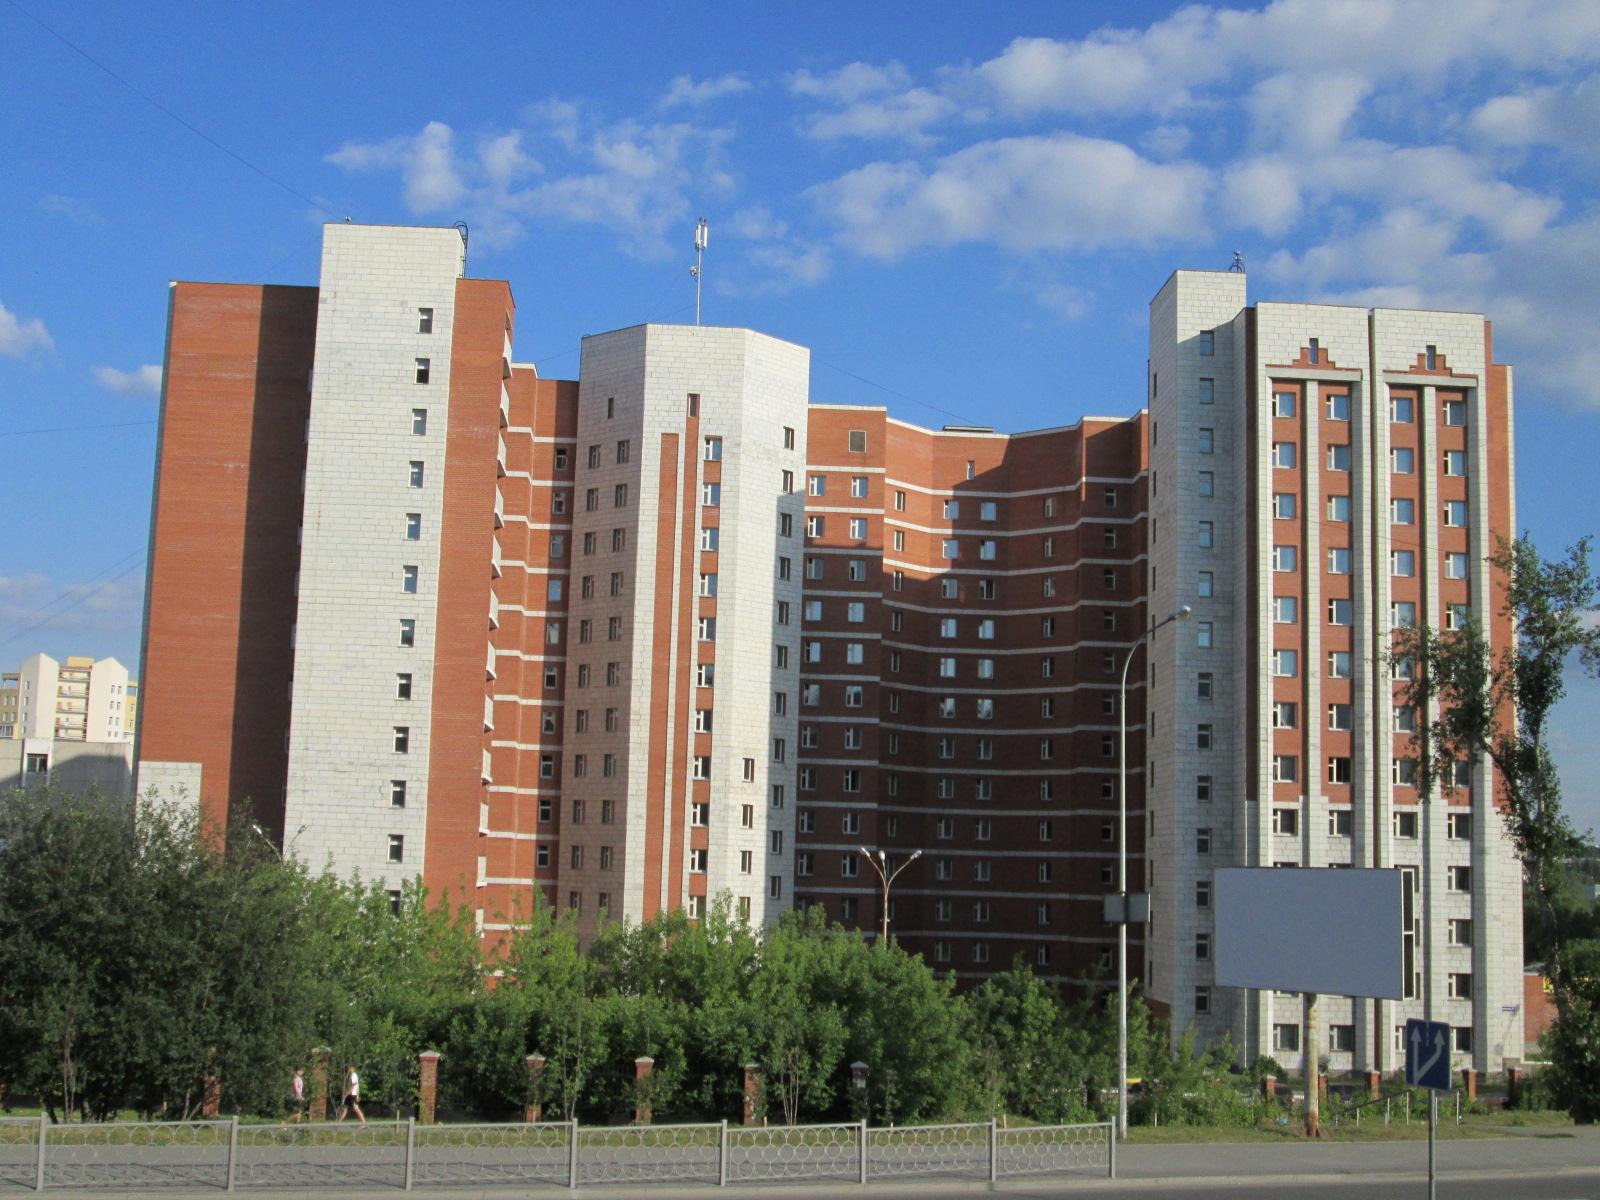 Ural Law Academy (USLA) in Yekaterinburg: address, faculties, reviews 79